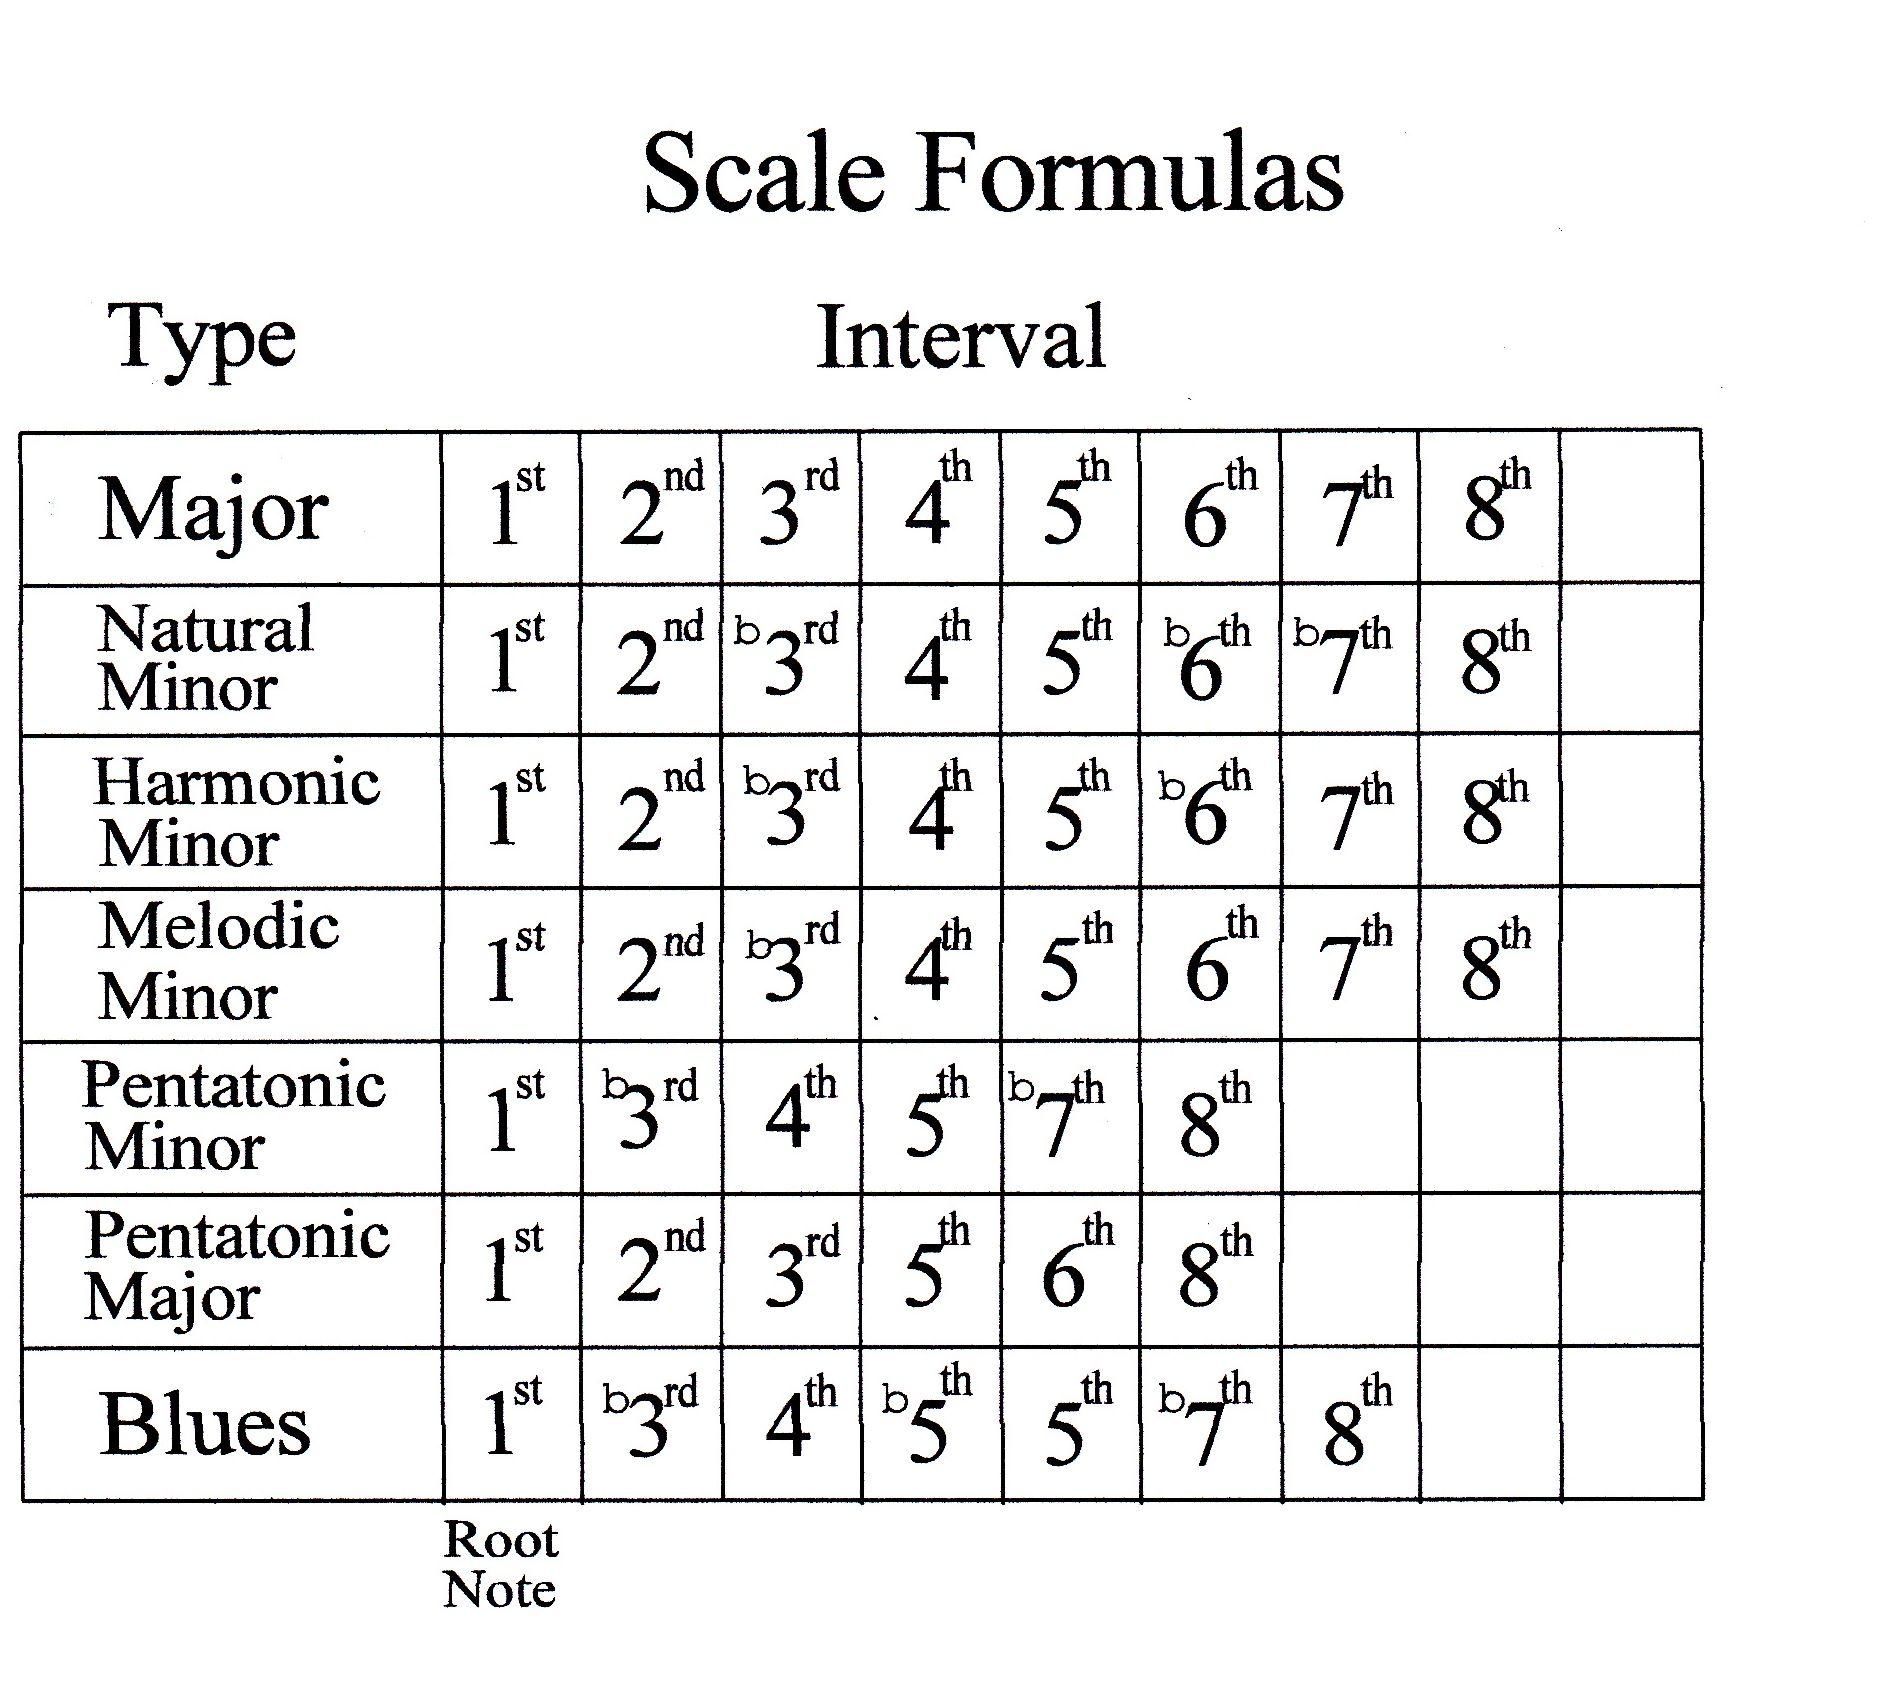 Minor Scale Formula